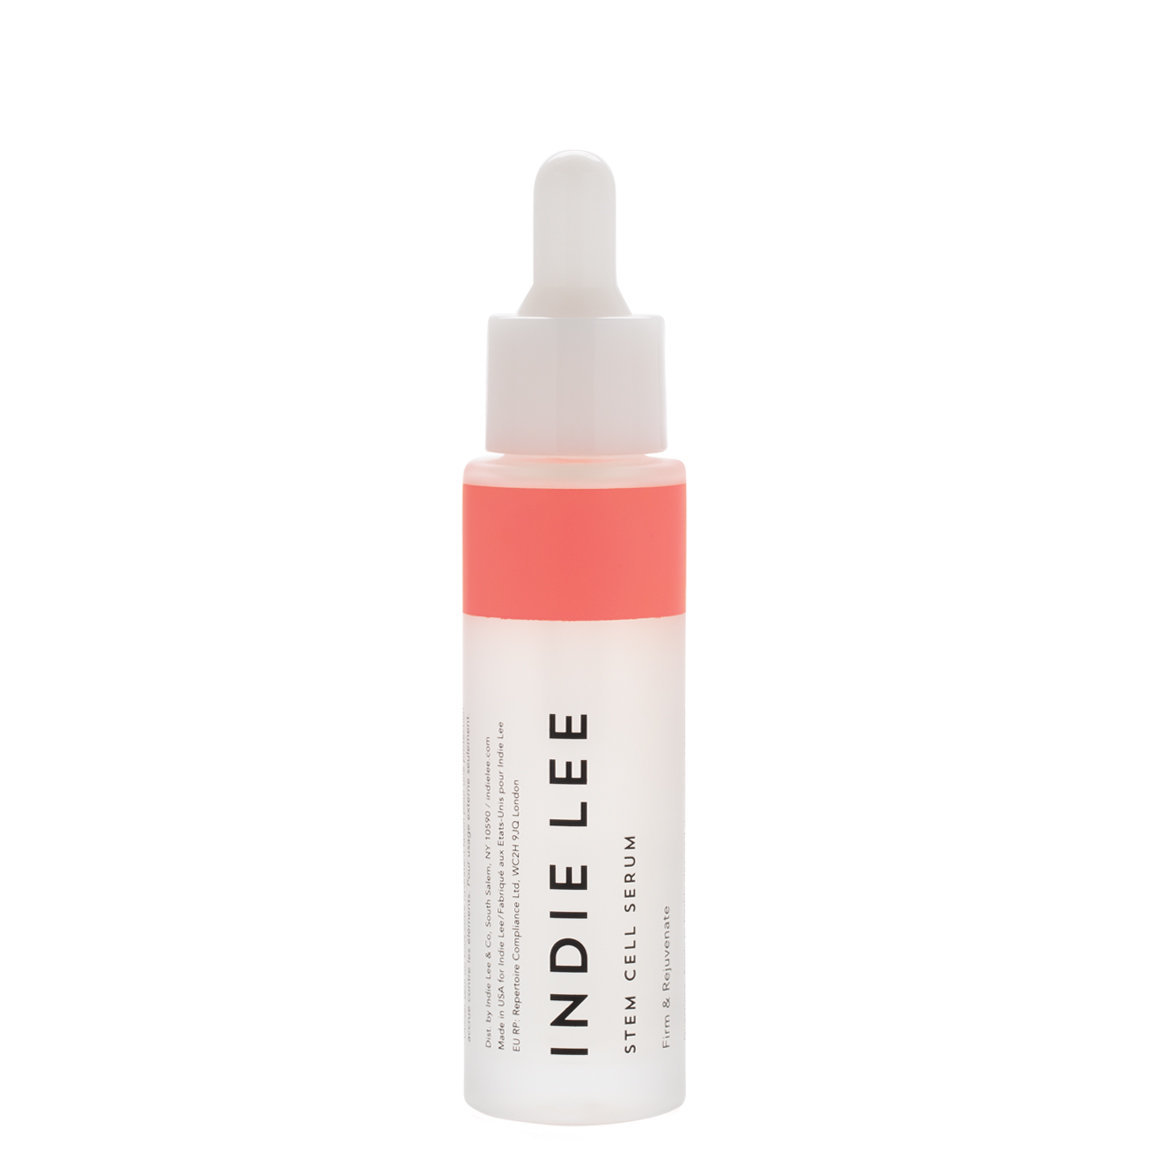 Indie Lee Stem Cell Serum 30 ml alternative view 1 - product swatch.